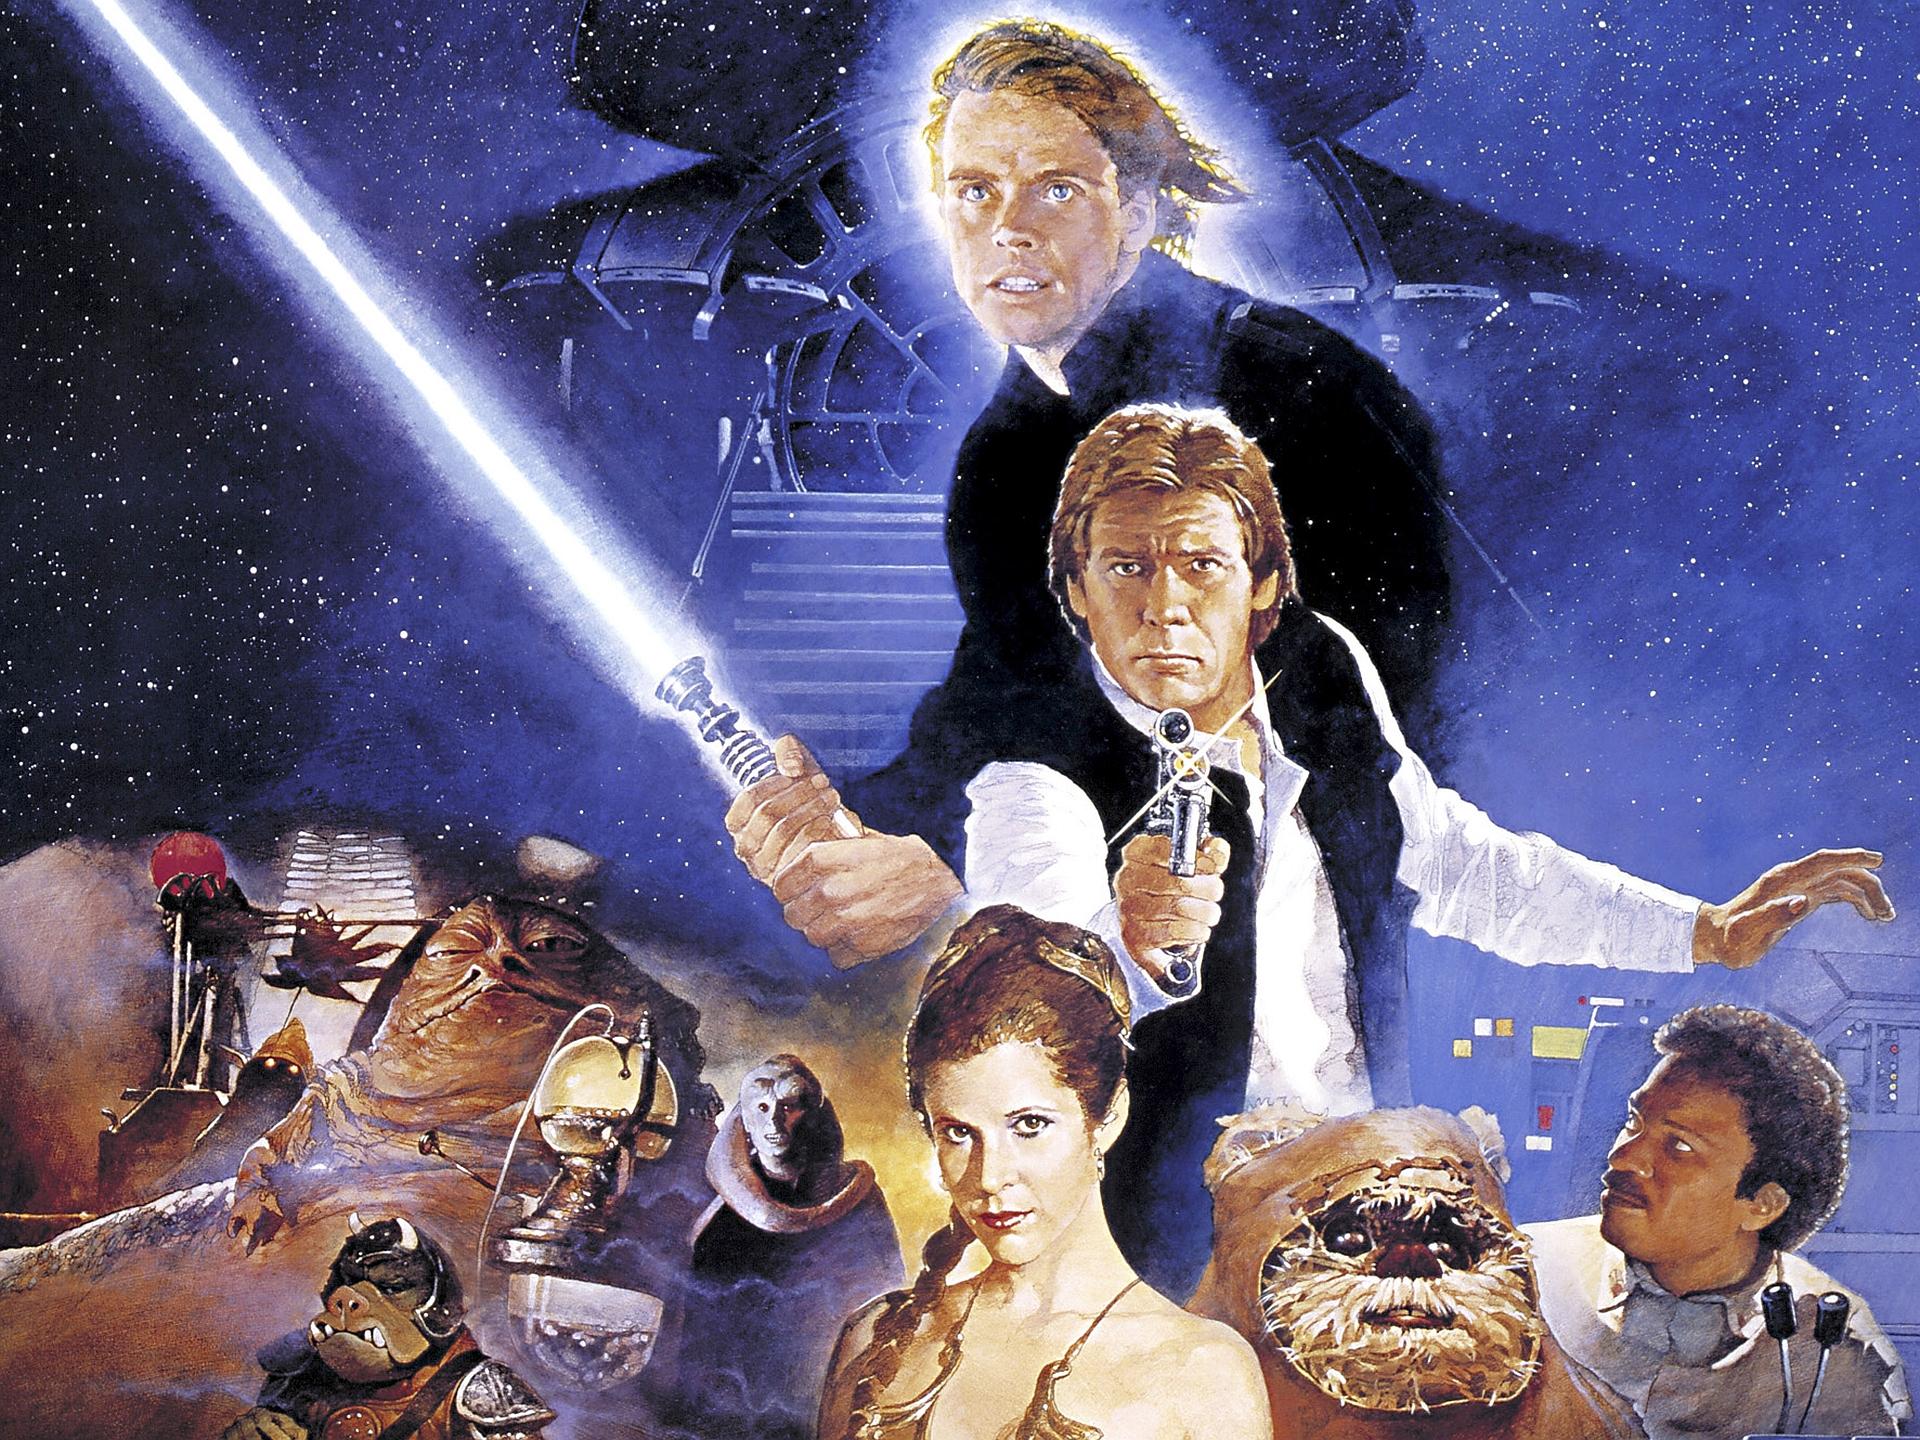 Star Wars Episode VI Return Of The Jedi Full HD Wallpaper And